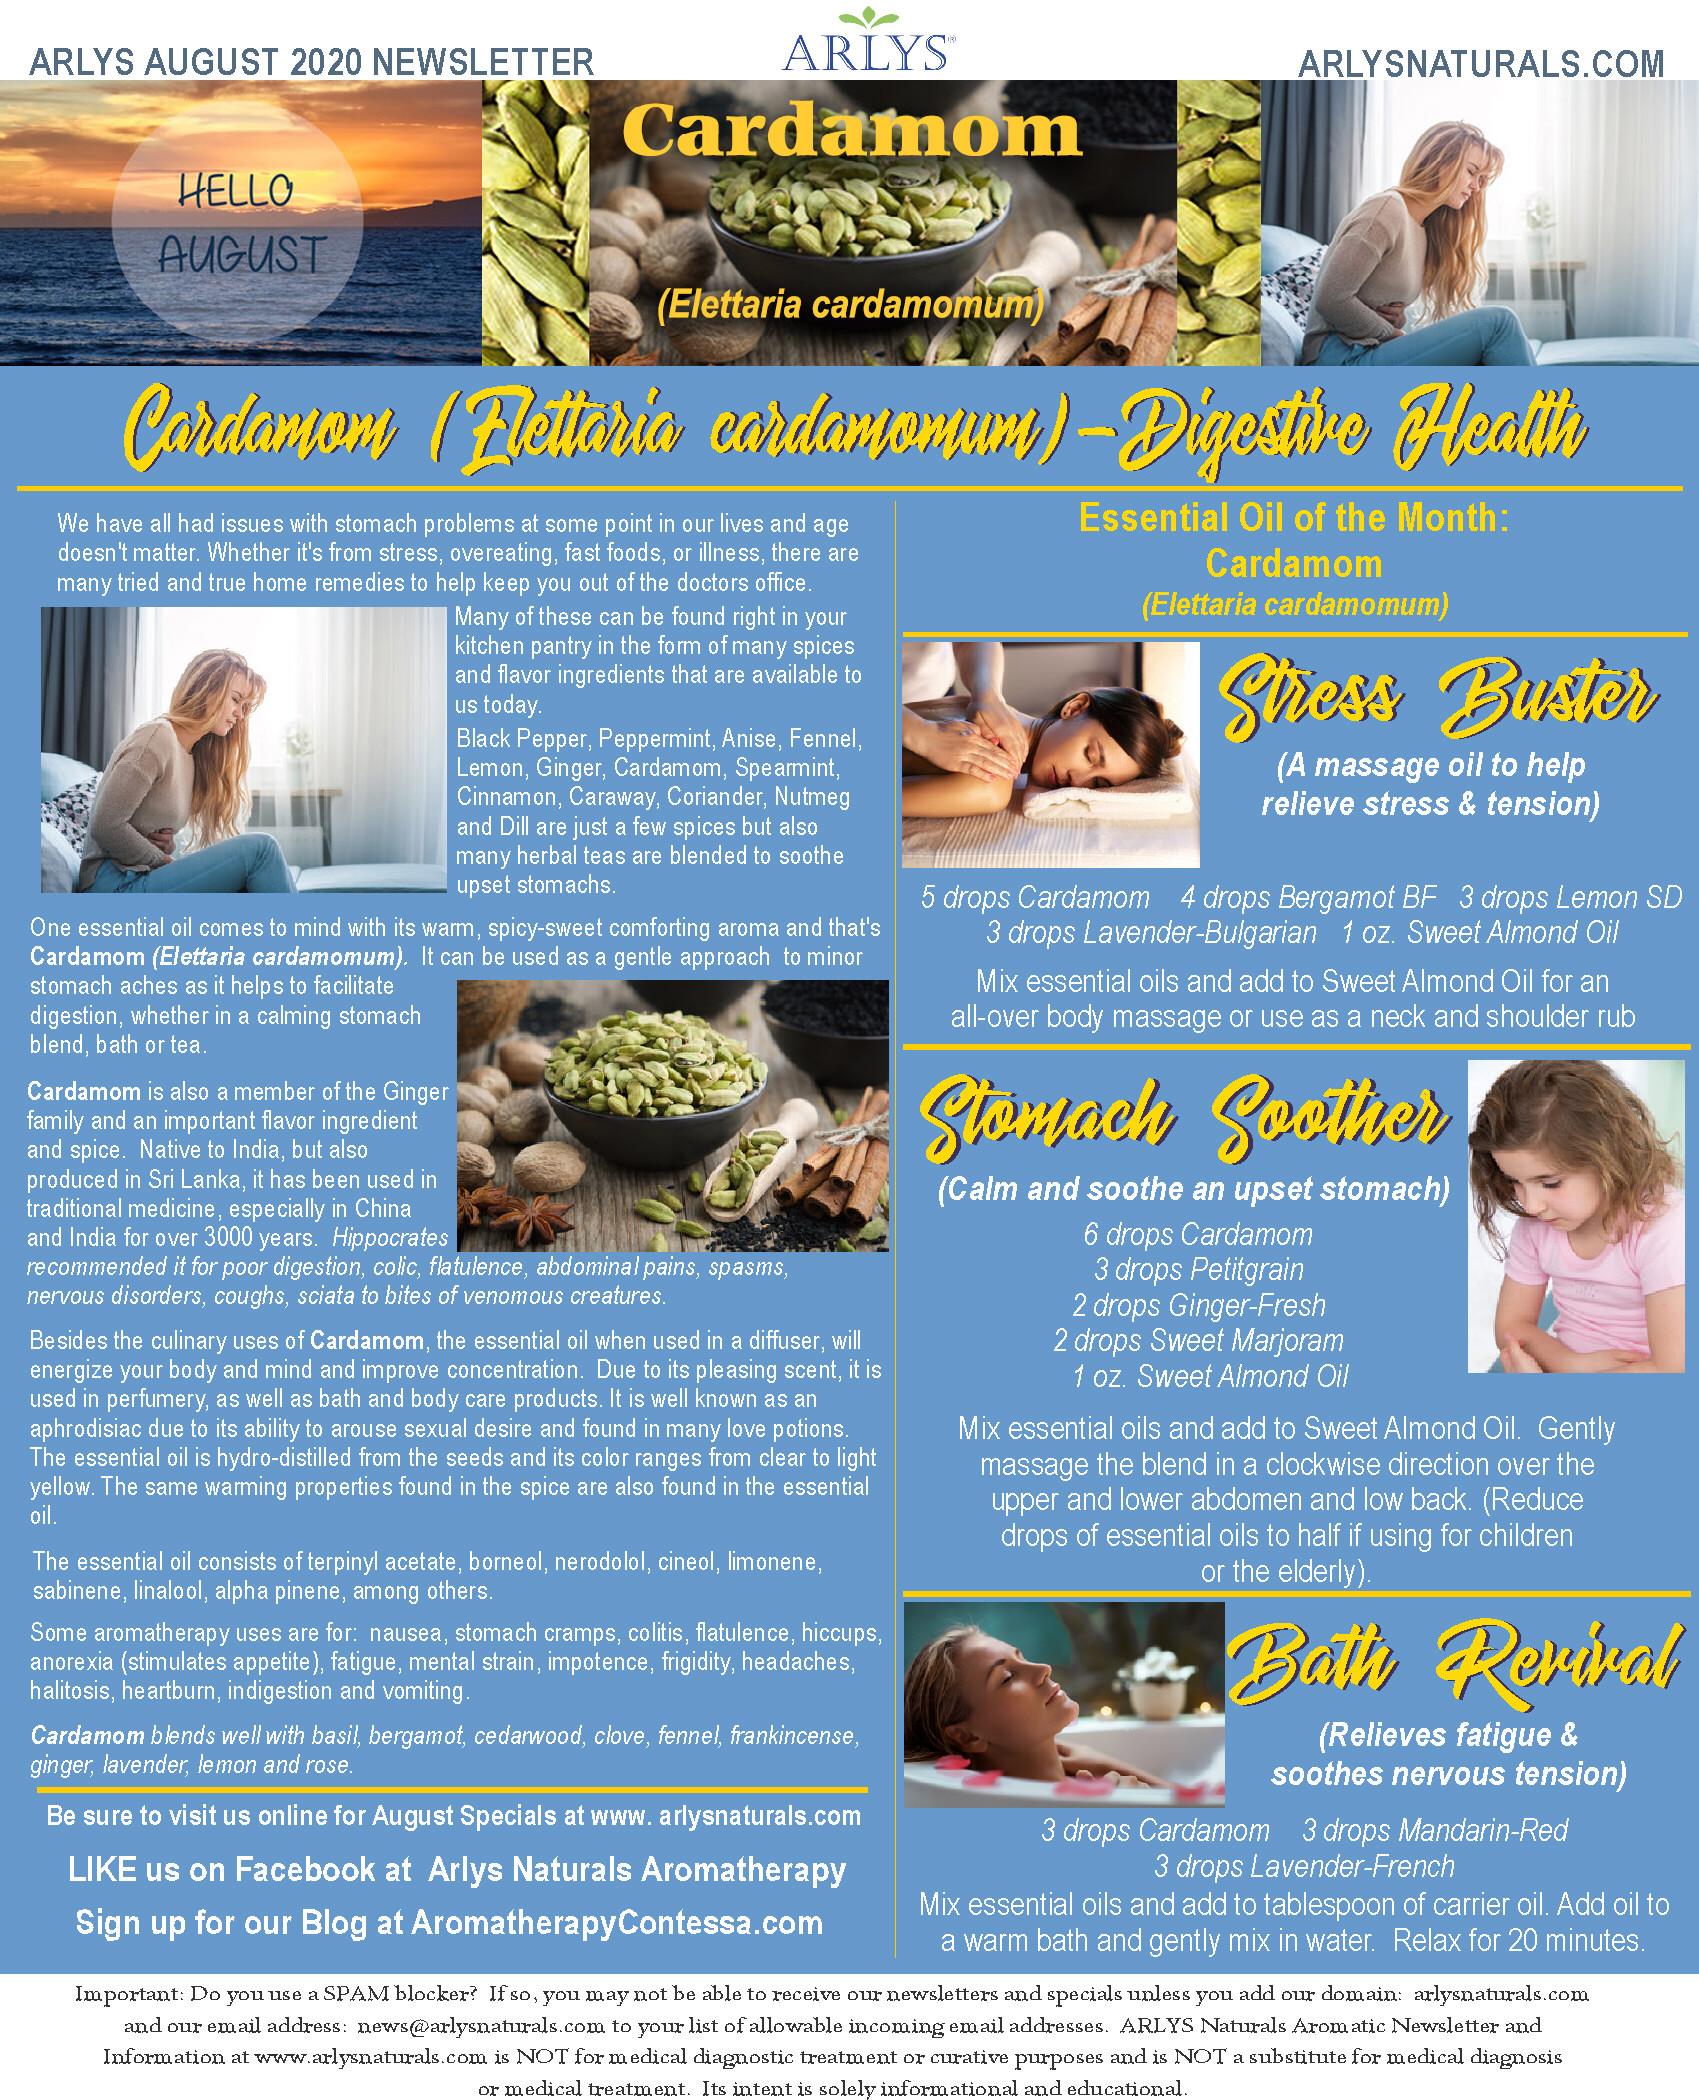 August 2020 Newsletter-Cardamom-Digestive Health